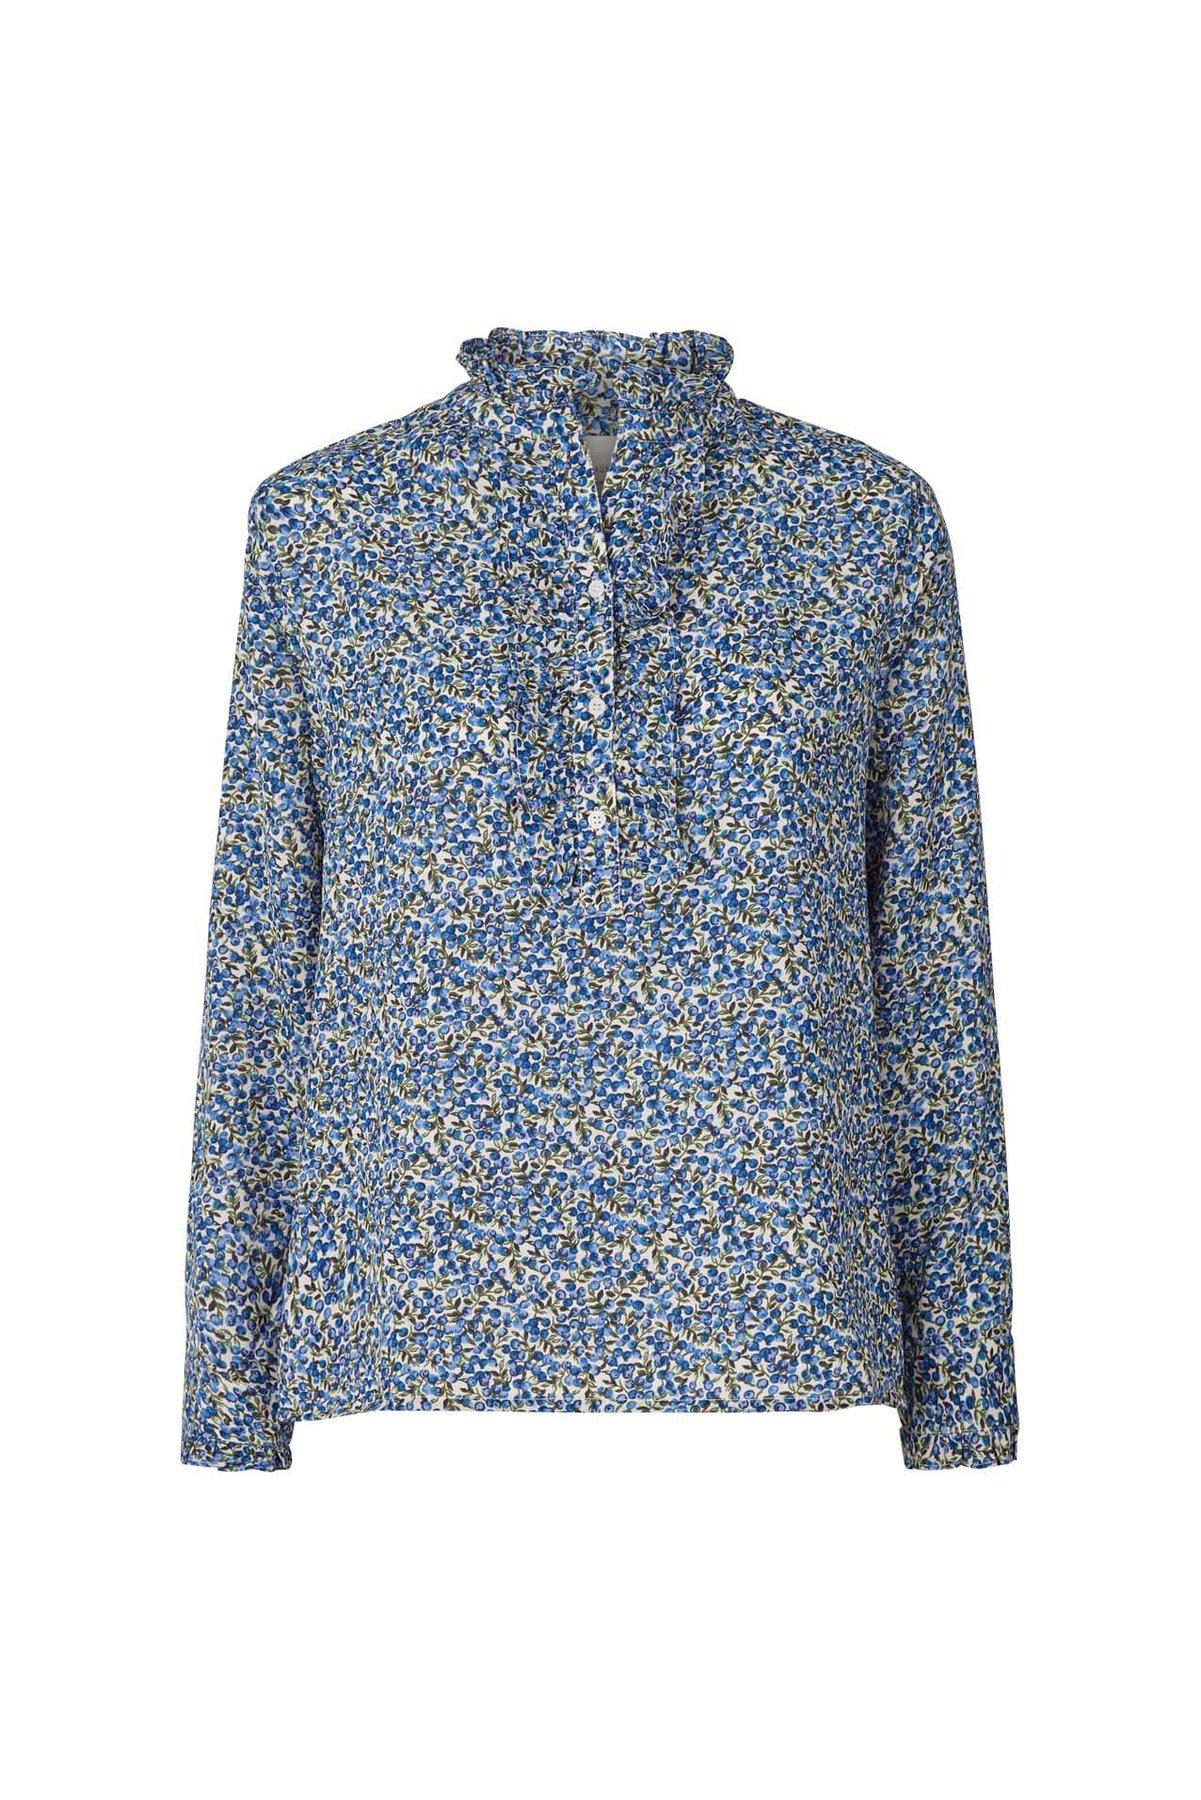 Franka Blue Flower Shirt